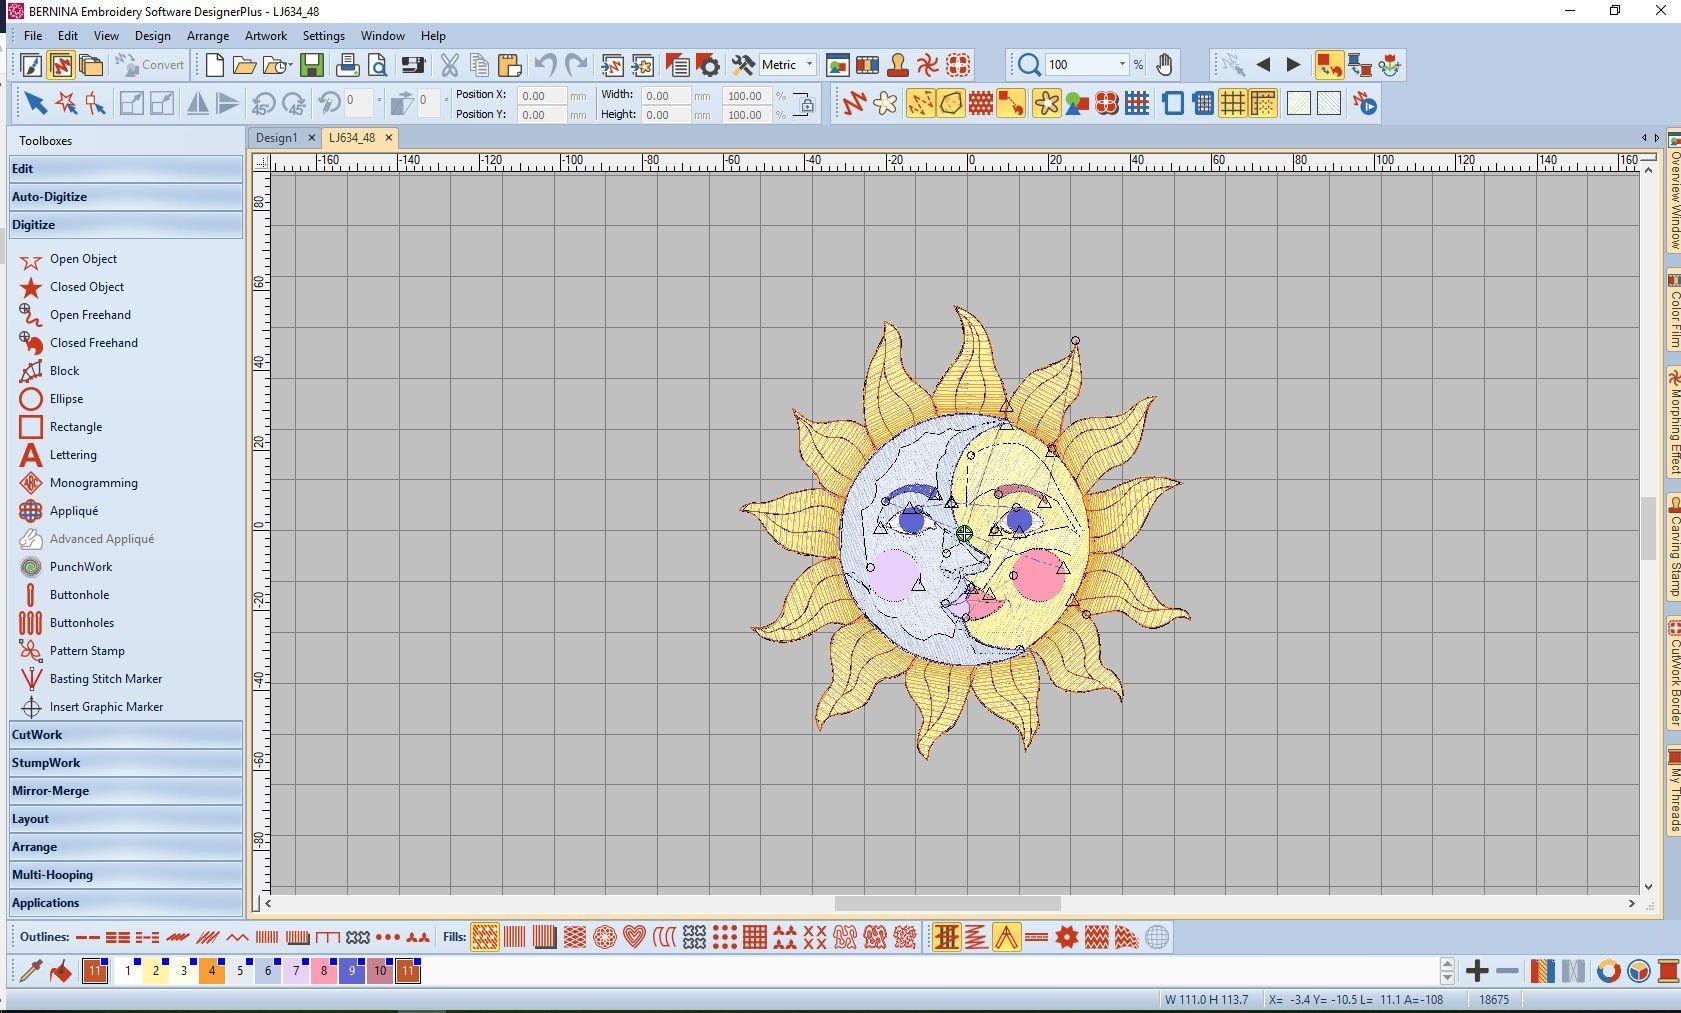 Lesson 7: BERNINA Embroidery Software V8: Transform Toolbar